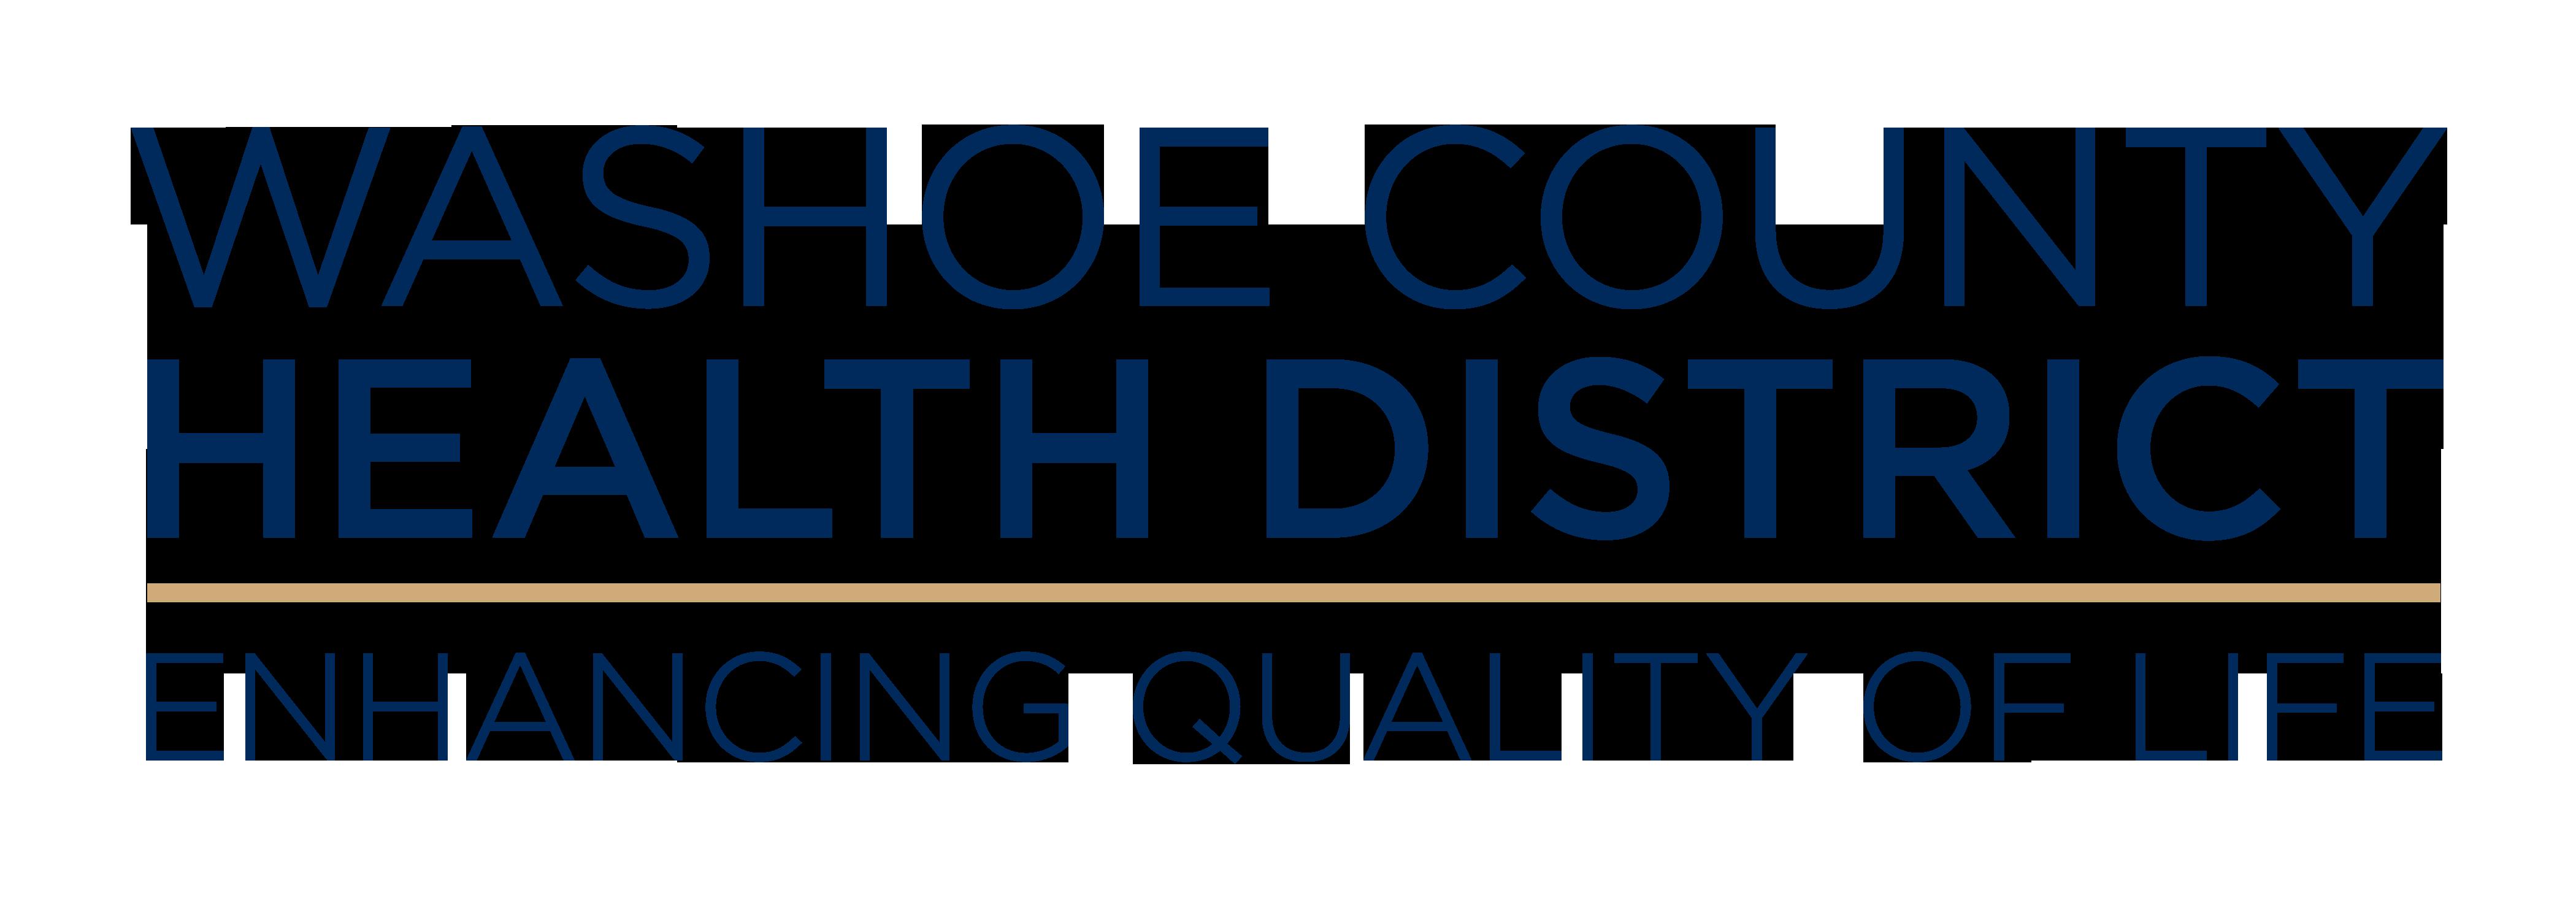 Health District Environmental Health Services